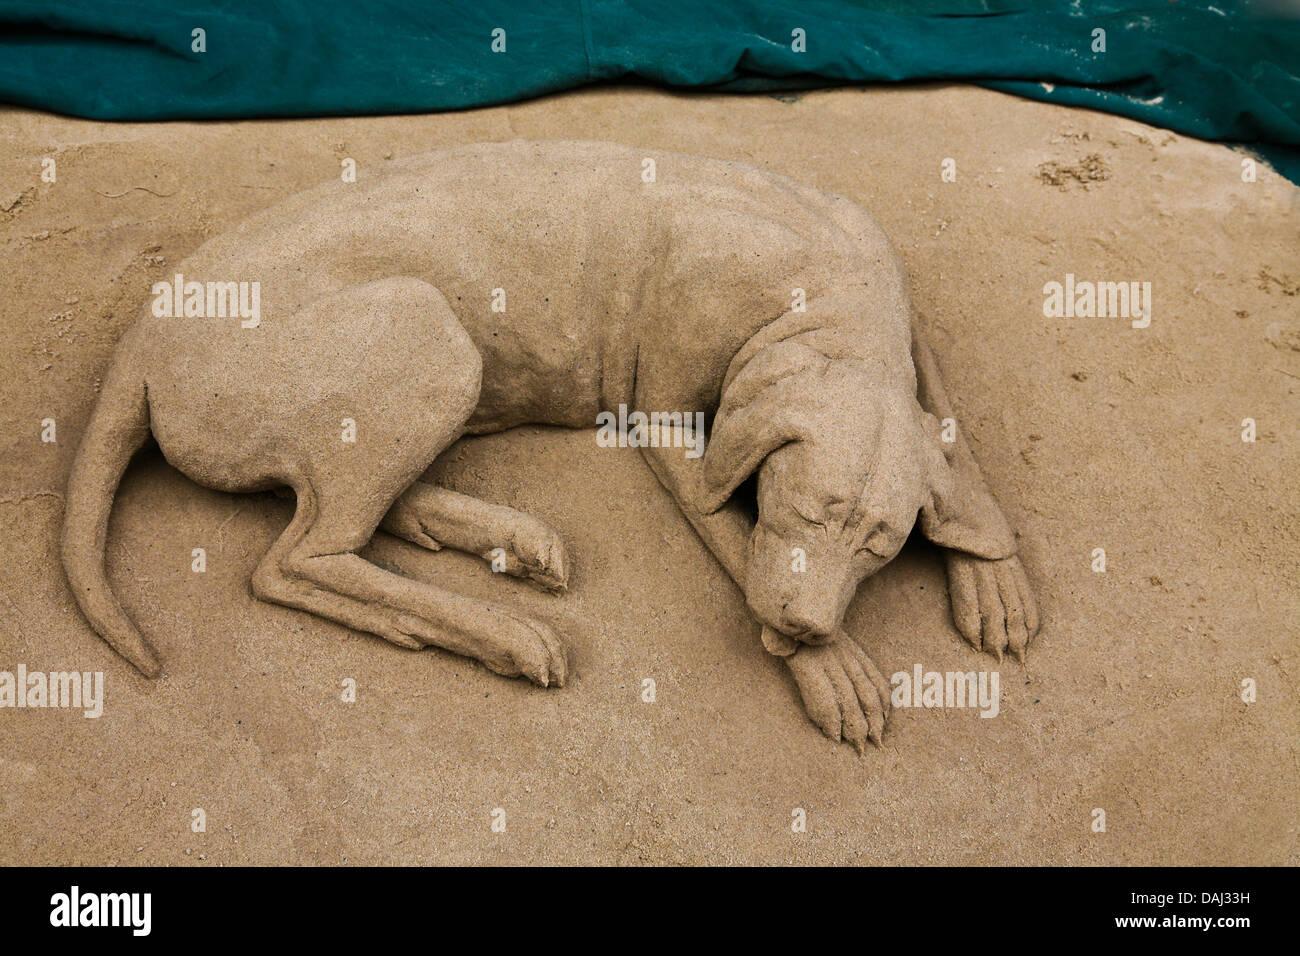 Close up cute funny dog sleeping sand sculpture art made by a street performer, Grafton Street,  Dublin, Ireland, - Stock Image